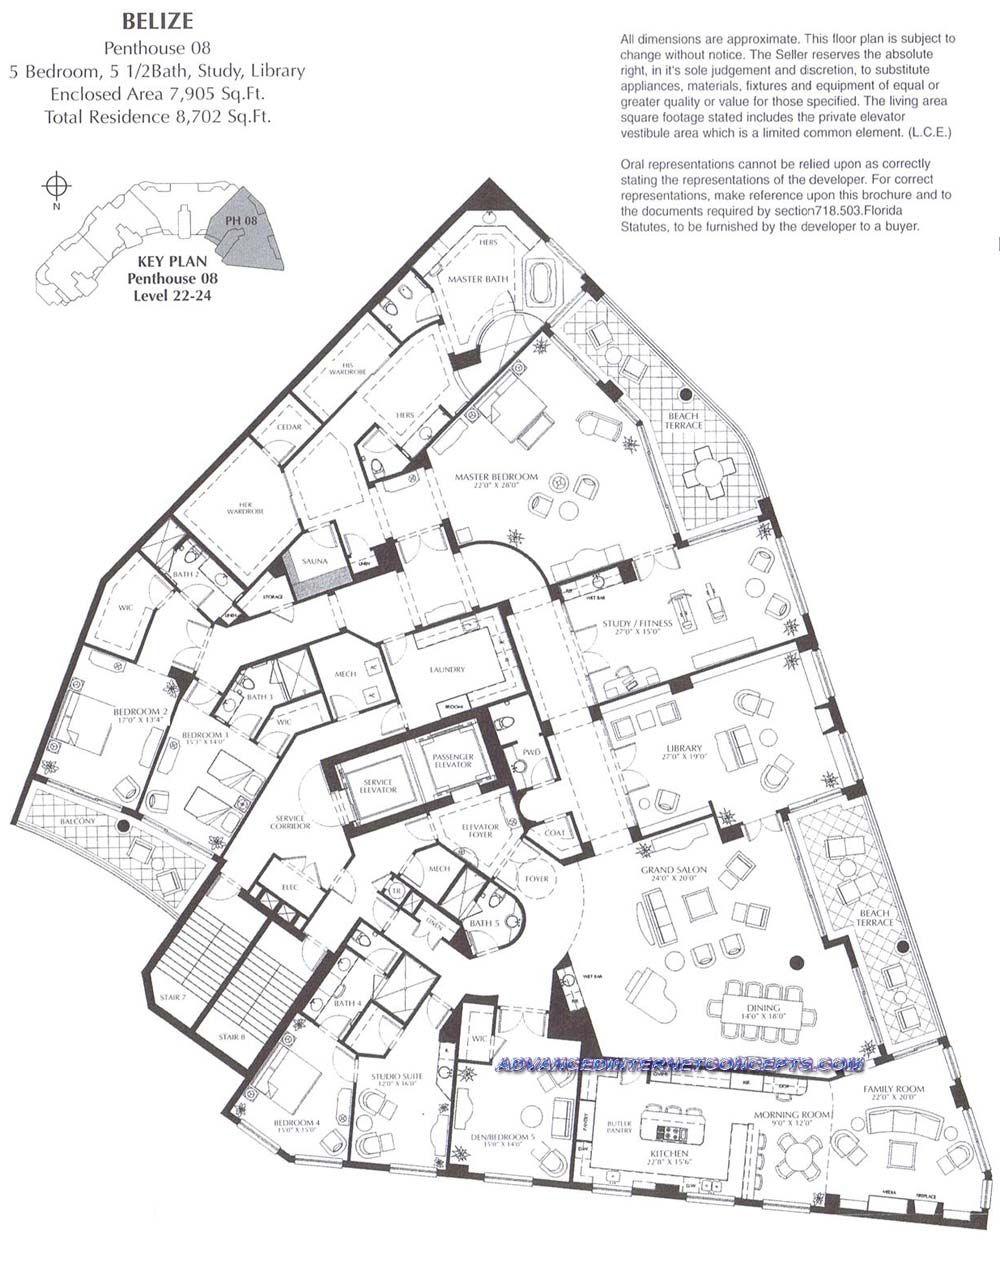 da23dbf931727a68c60688fe64409542 Luxury Pent House With Gym Building Floor Plan on